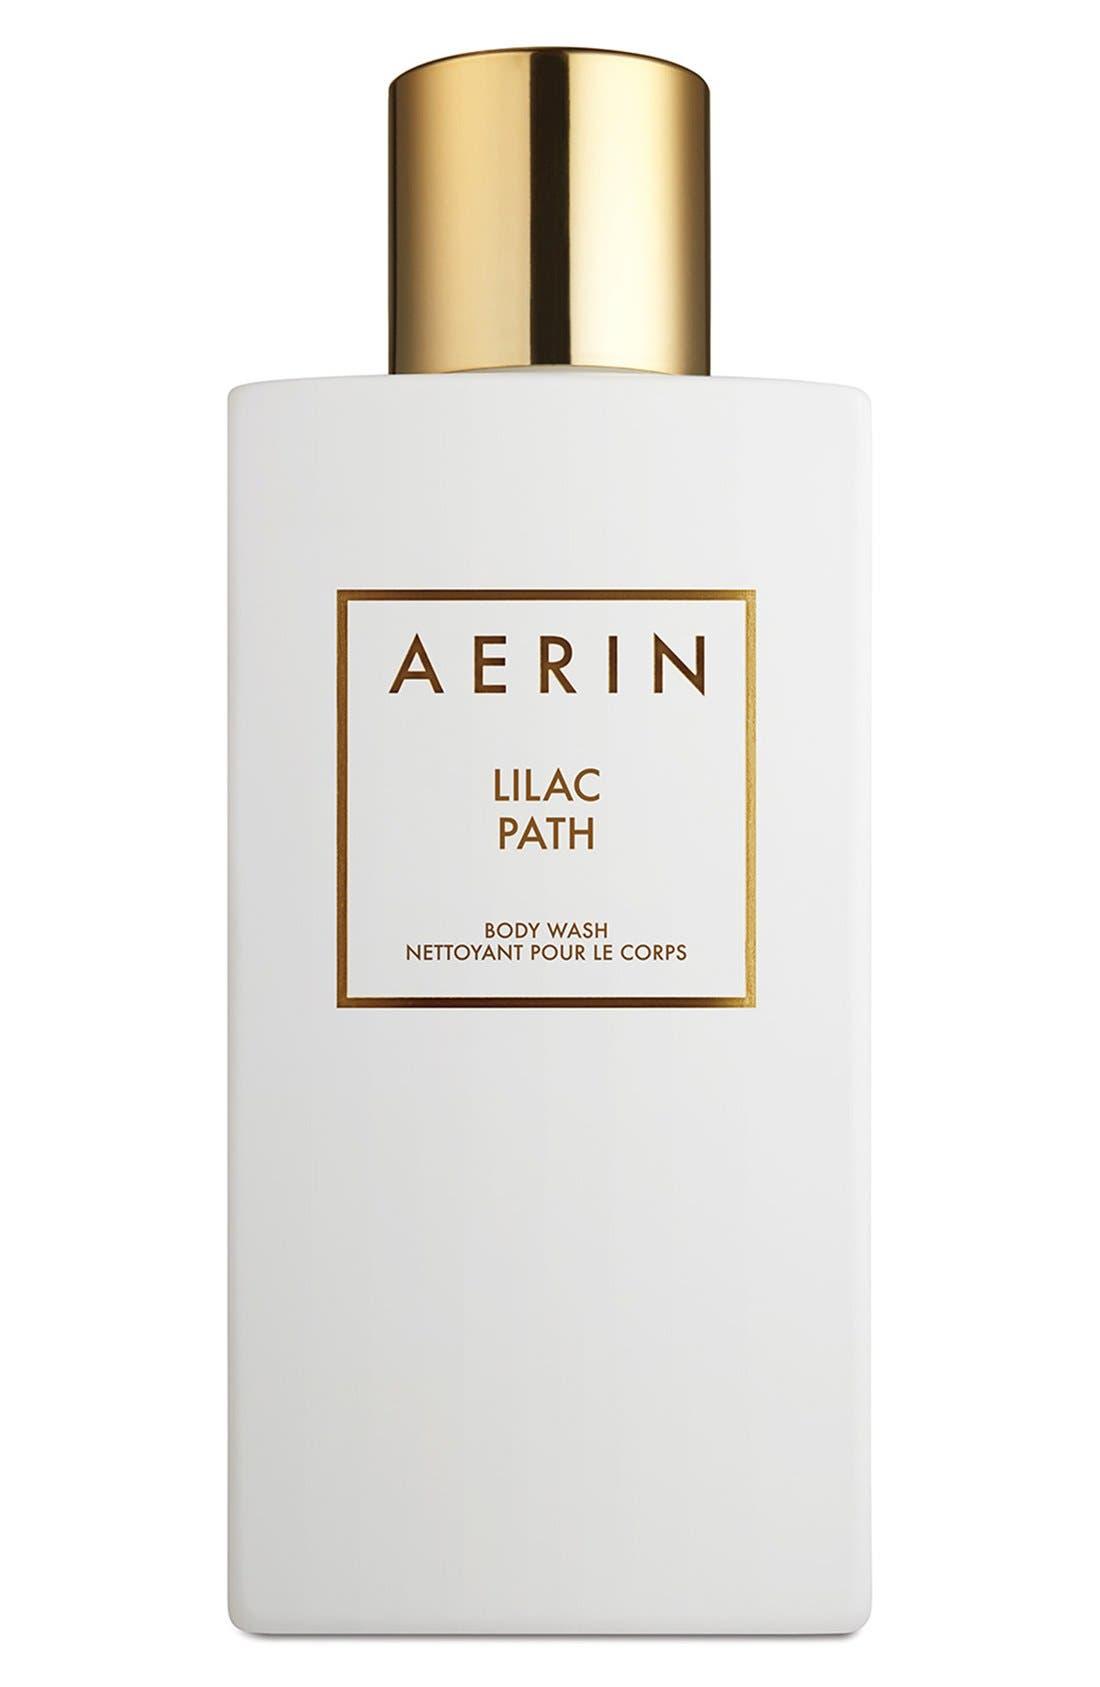 AERIN Beauty Lilac Path Body Wash,                             Main thumbnail 1, color,